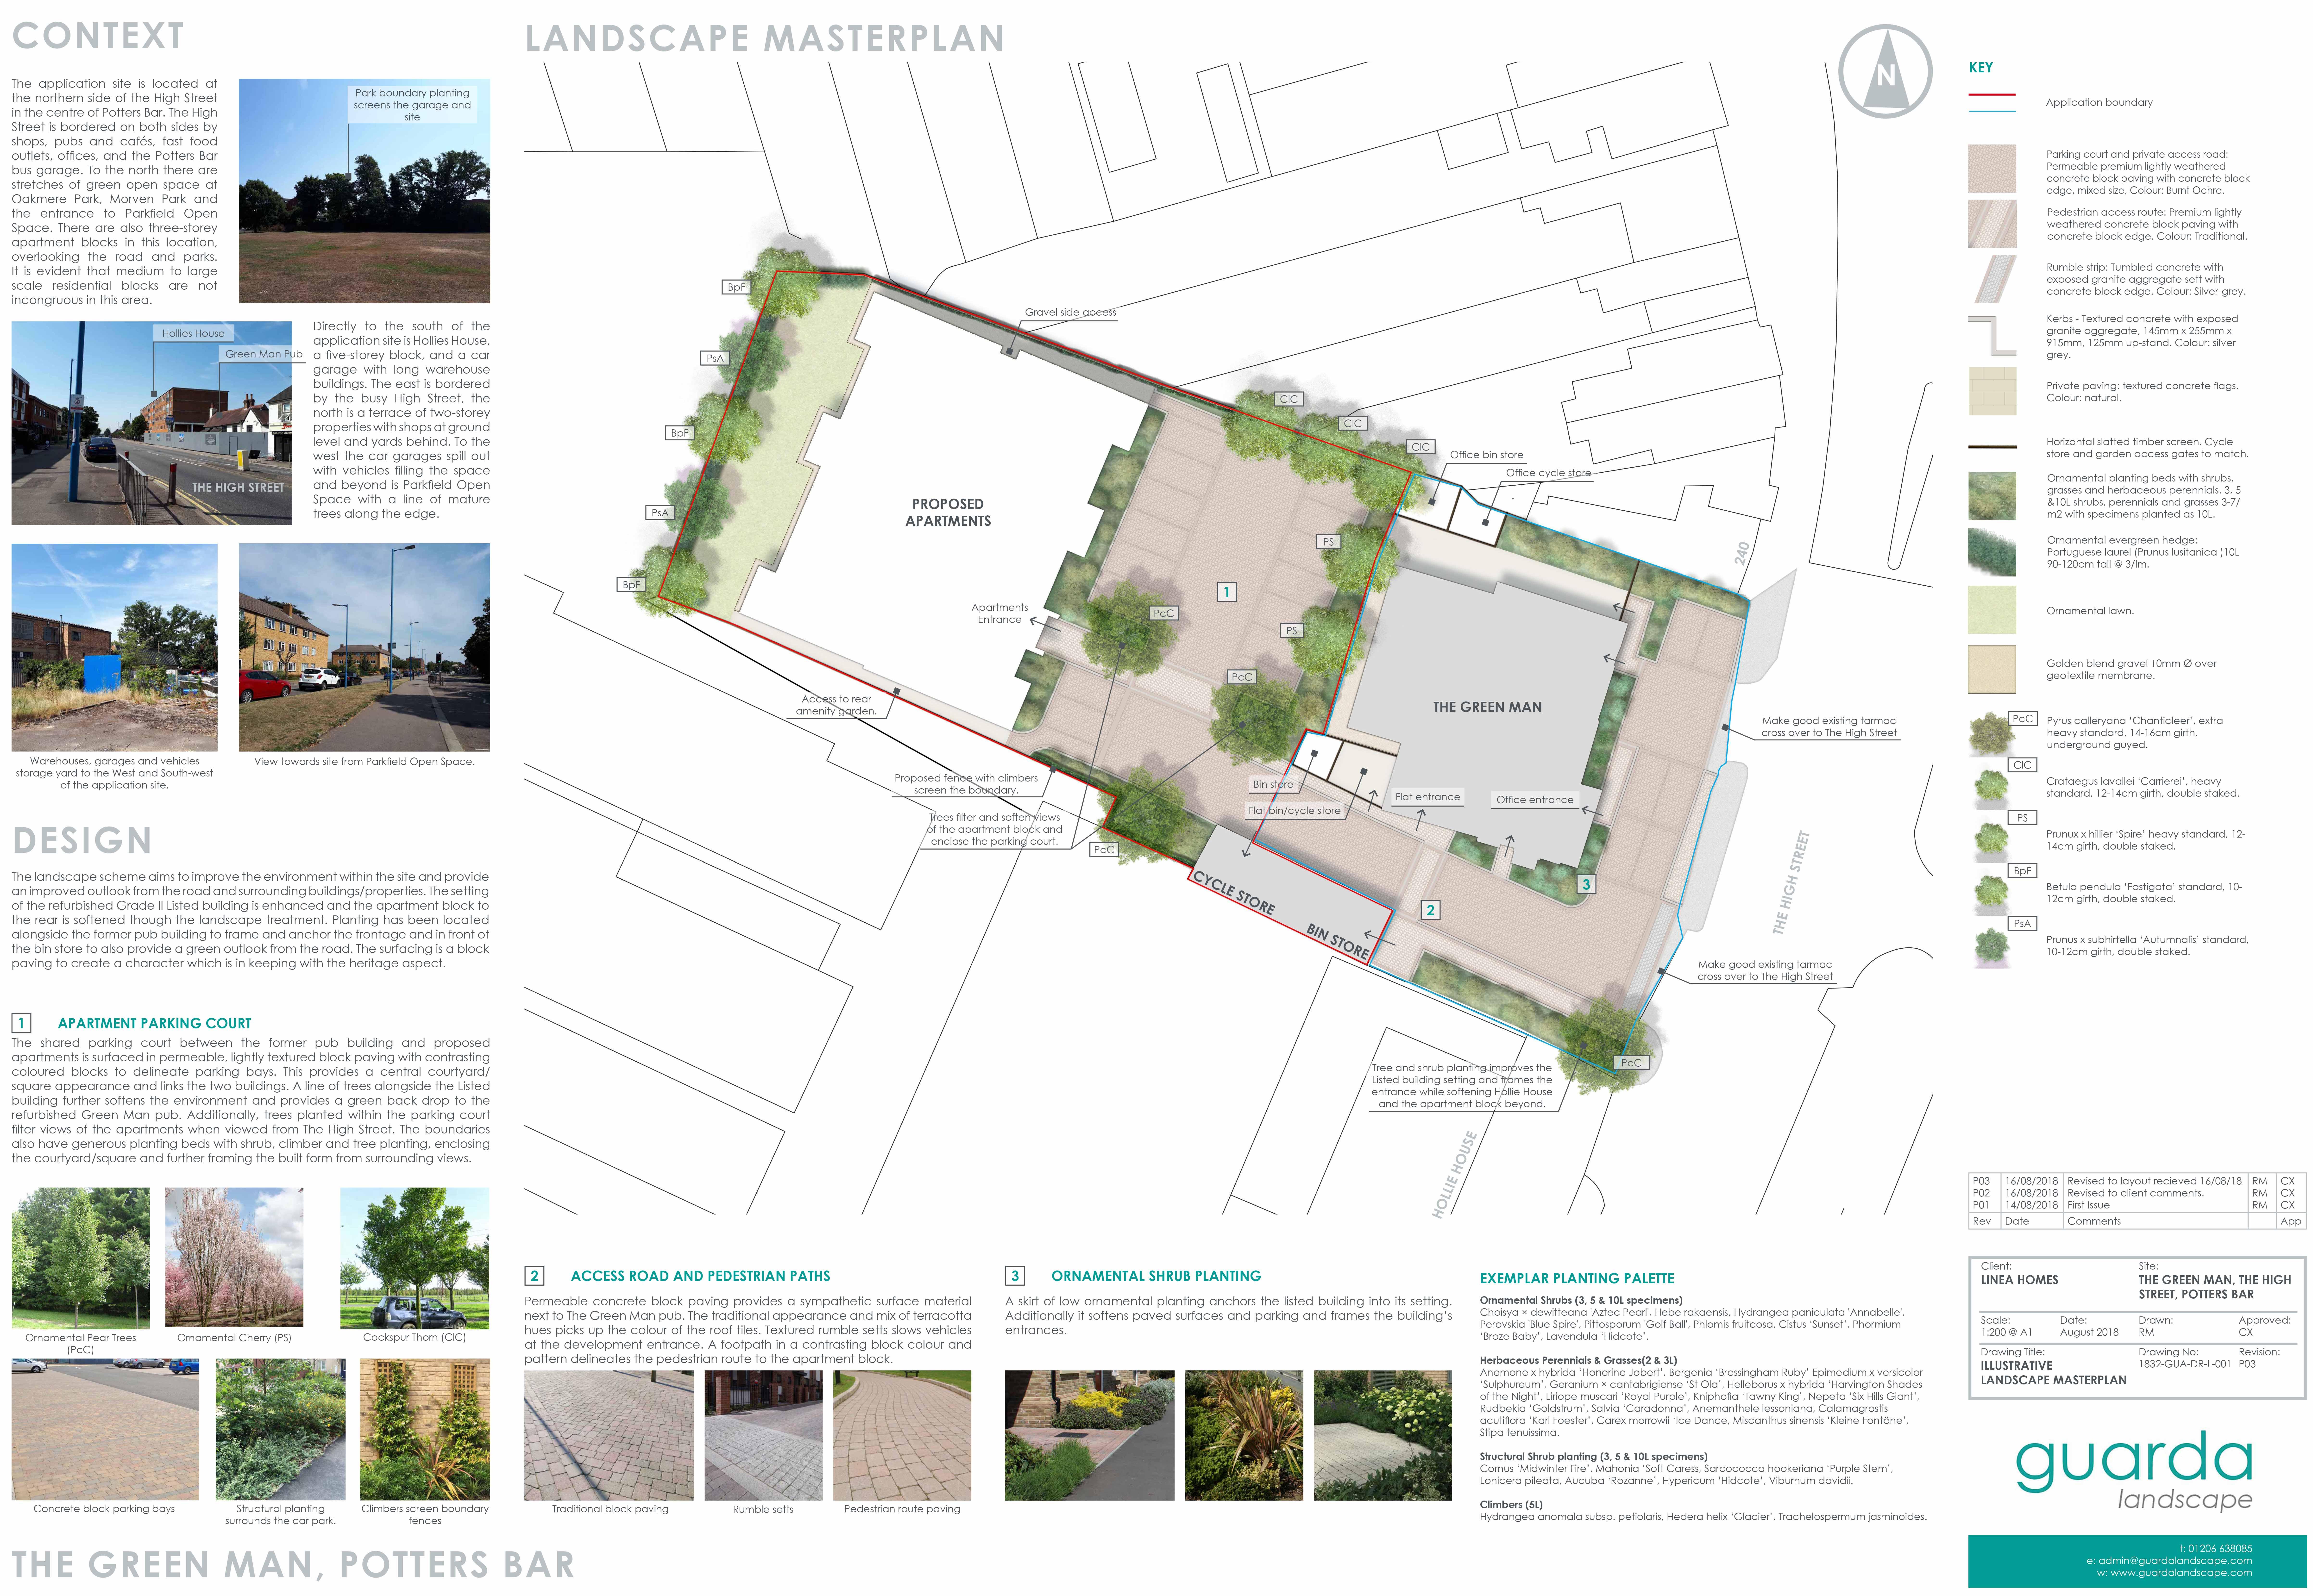 GUARDA Landscape Masterplan